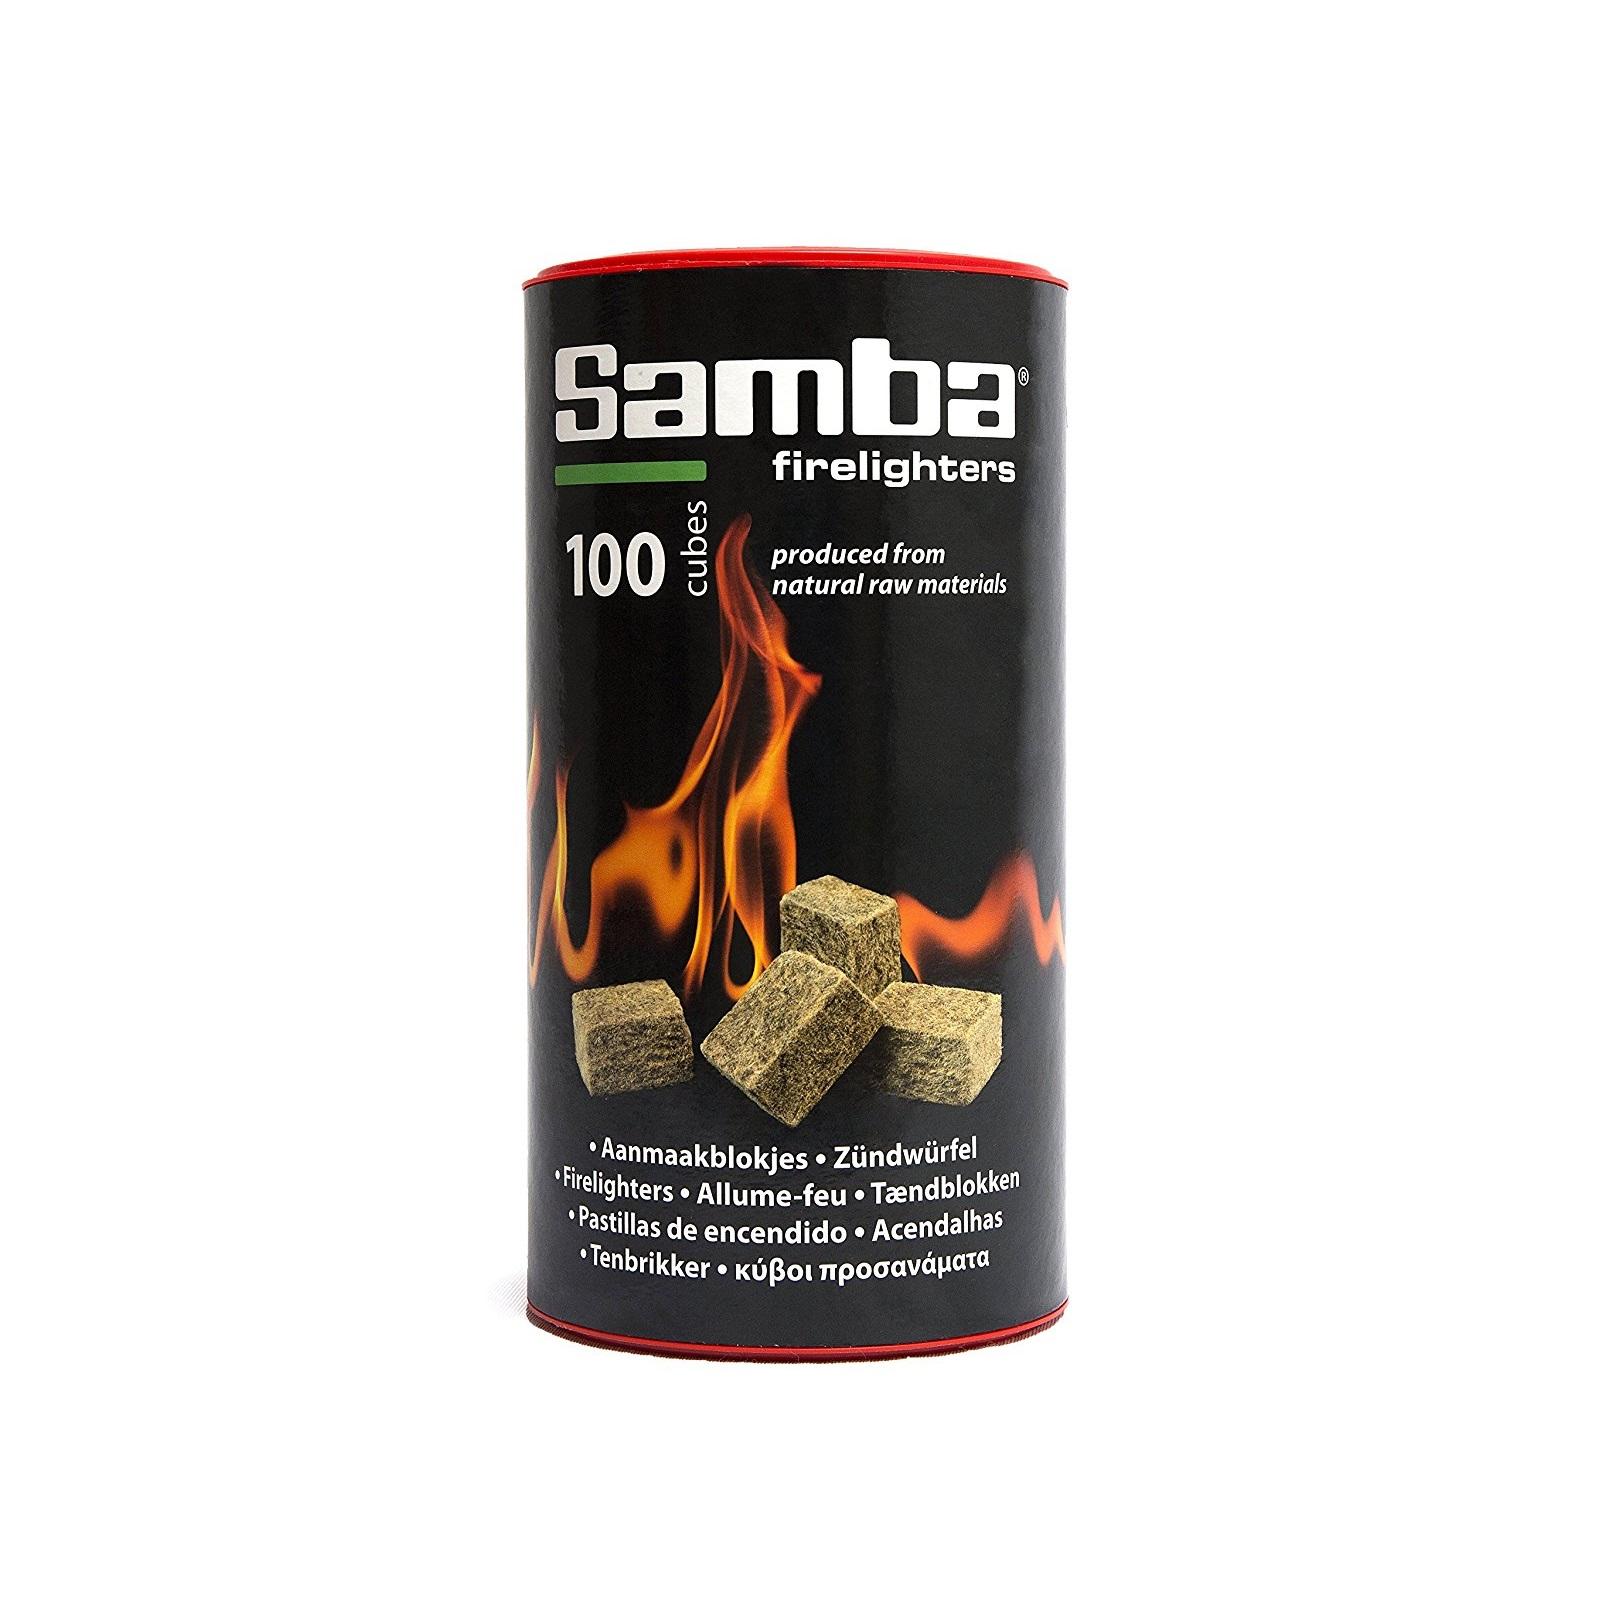 Carcoa Fuego Pastillas de encendido ecológico sin queroseno